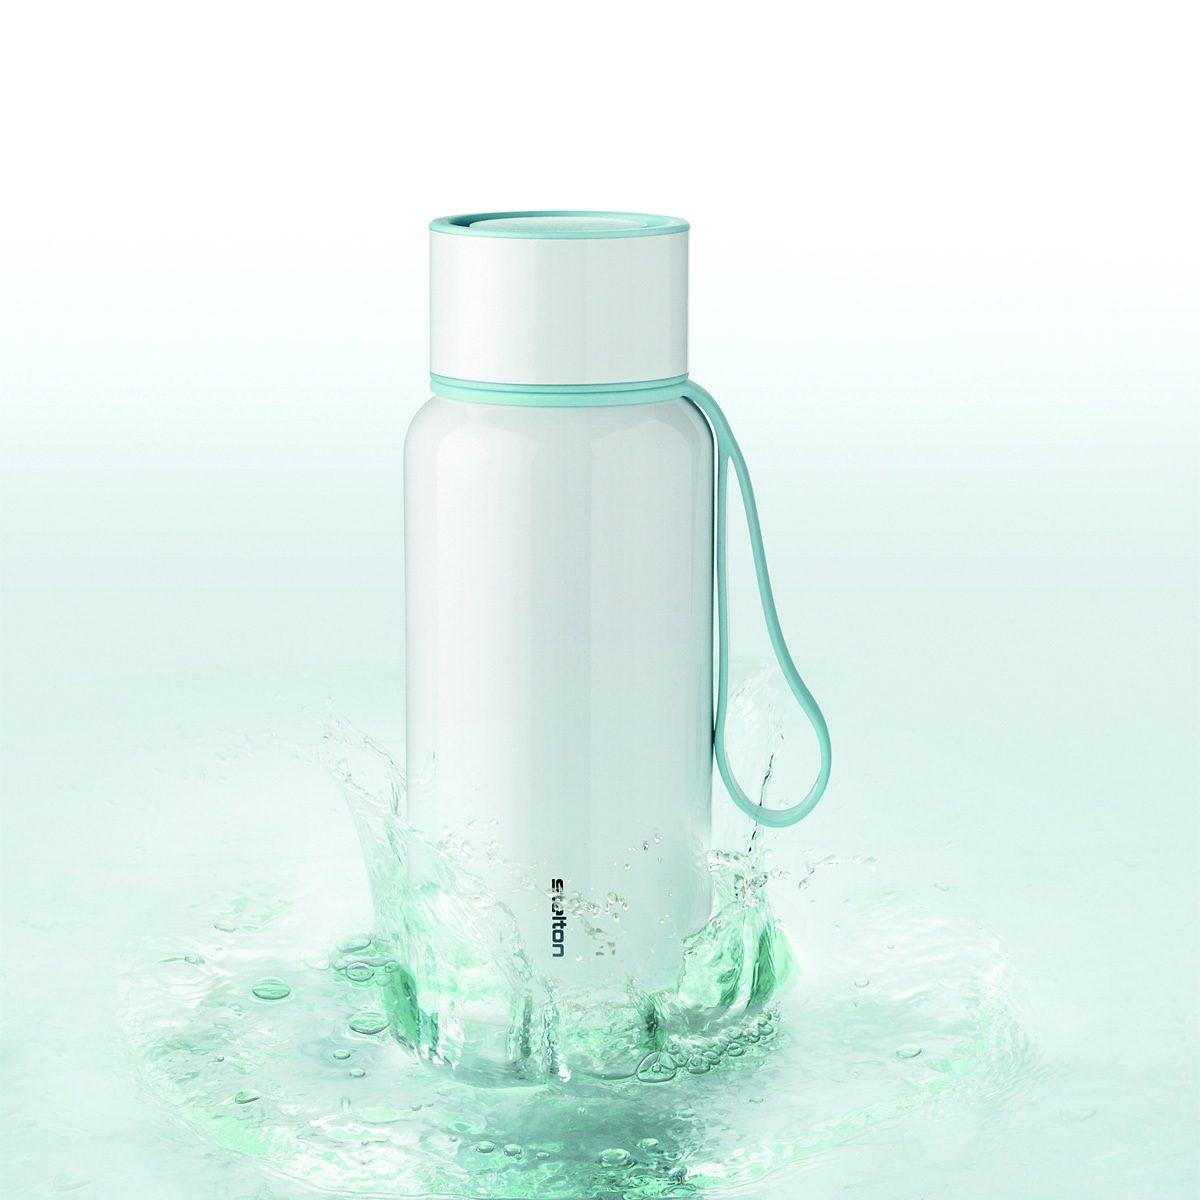 STELTON Stelton Trinkflasche To Go Water 0.75 l aqua